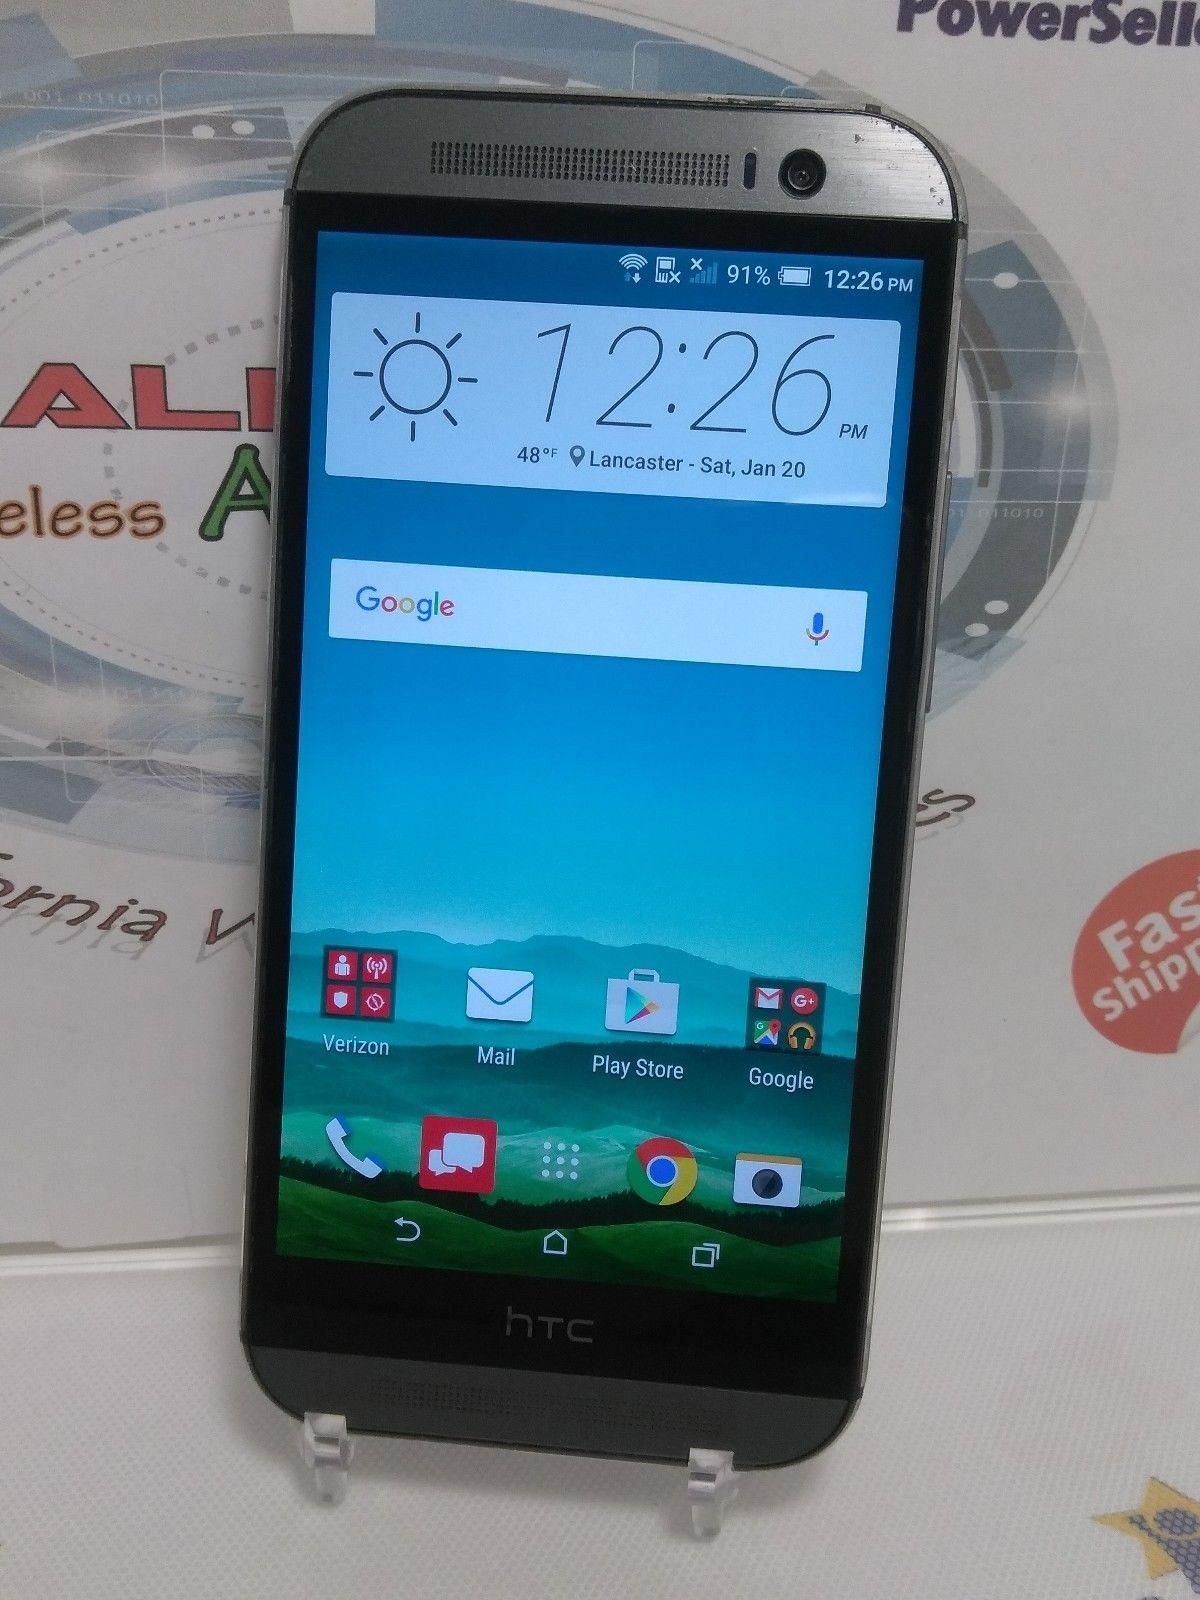 HTC One M8 - 32GB - Gunmetal Gray (Verizon/Unlock)Android